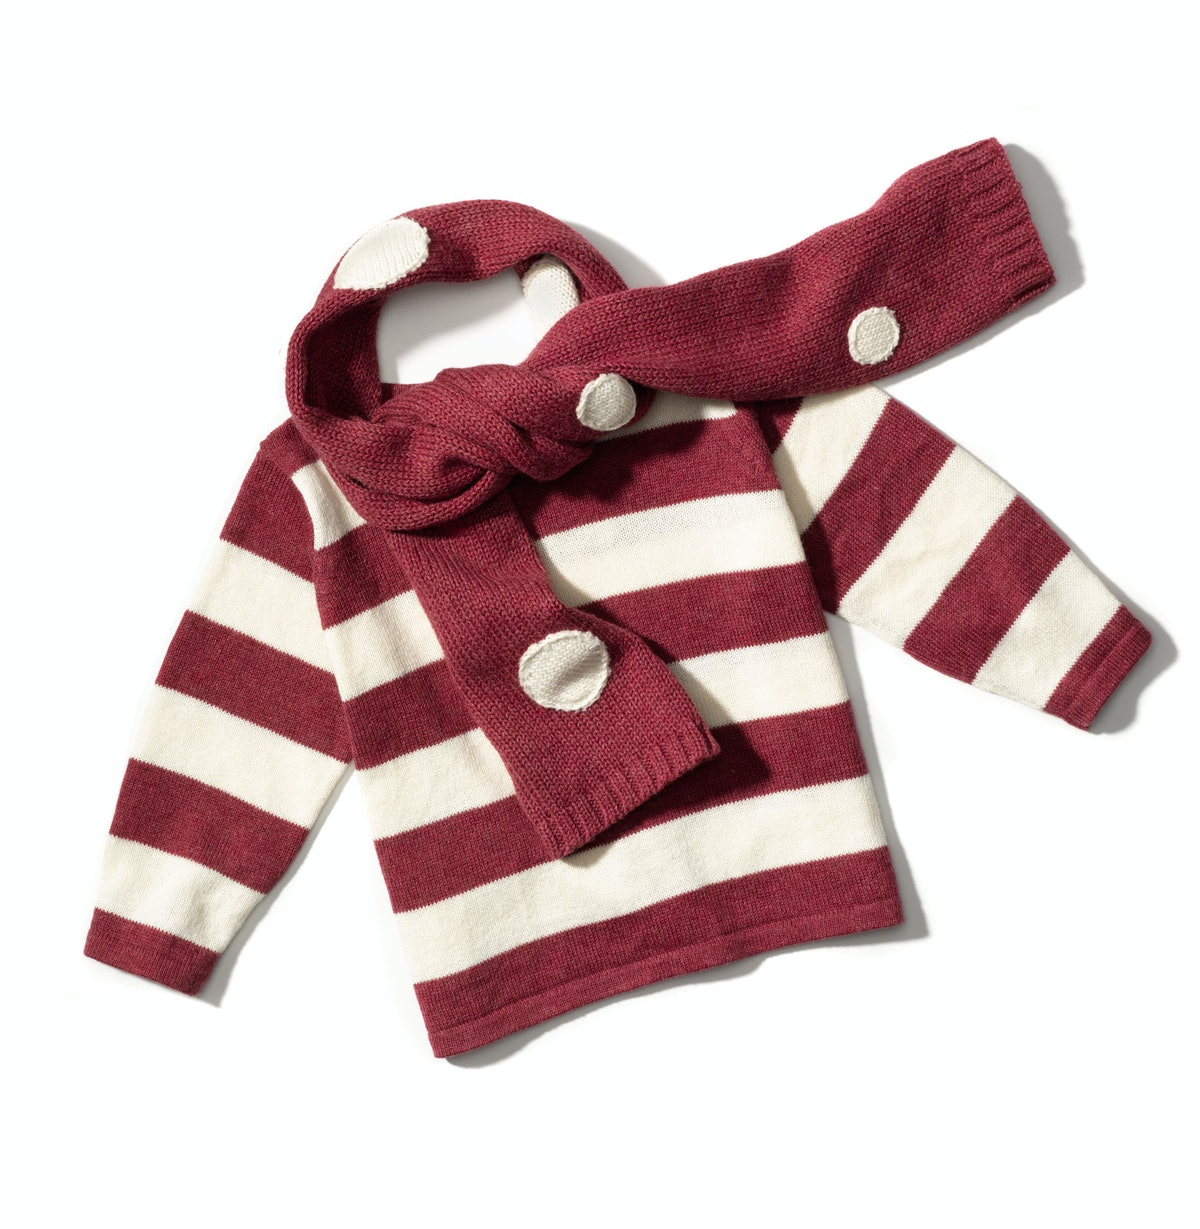 Tane Organics scarf, $48, and sweater, $98, [taneorganics.com](http://www.taneorganics.com/).